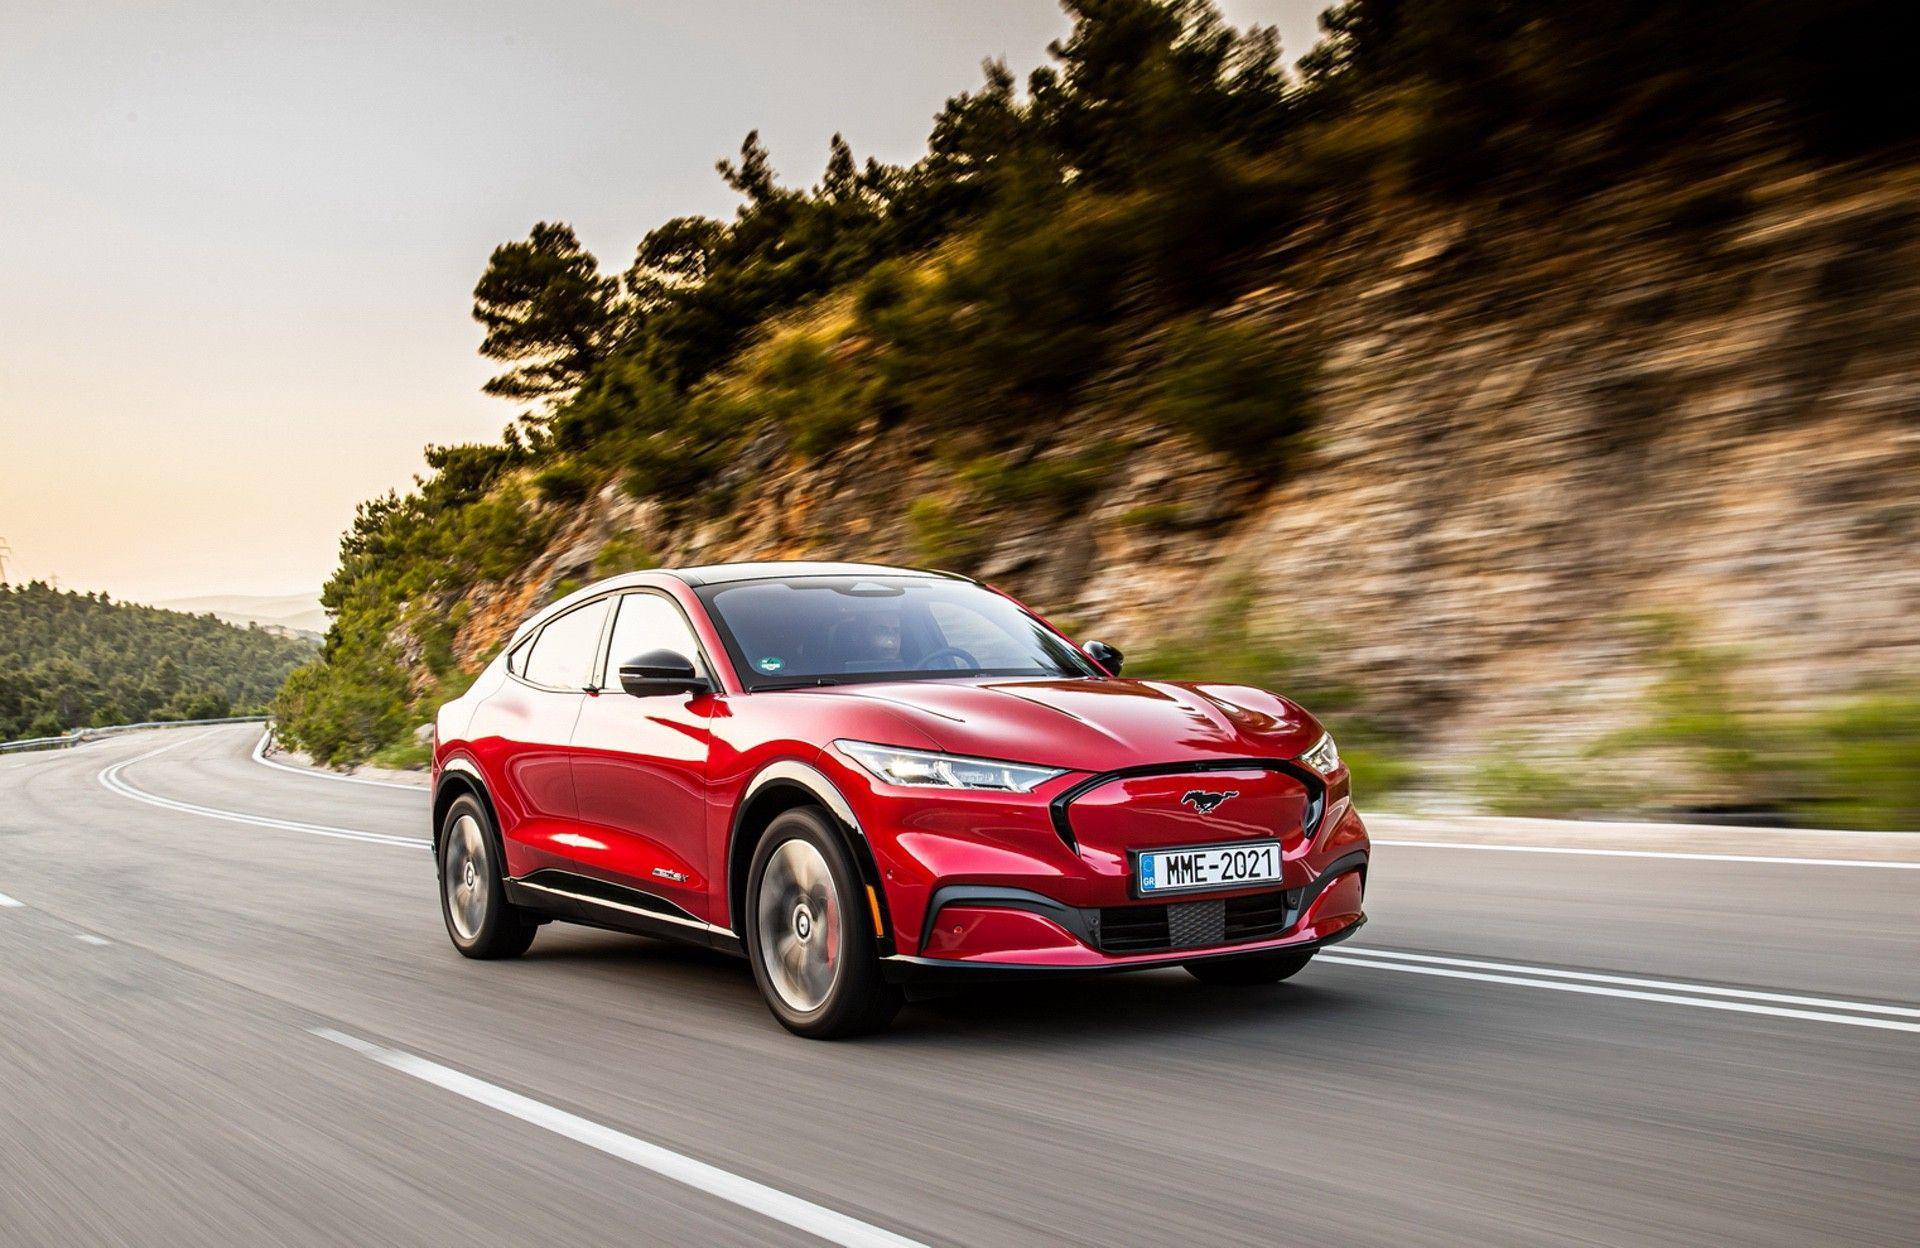 Ford_Mustang_Mach-E_greek_presskit-0071